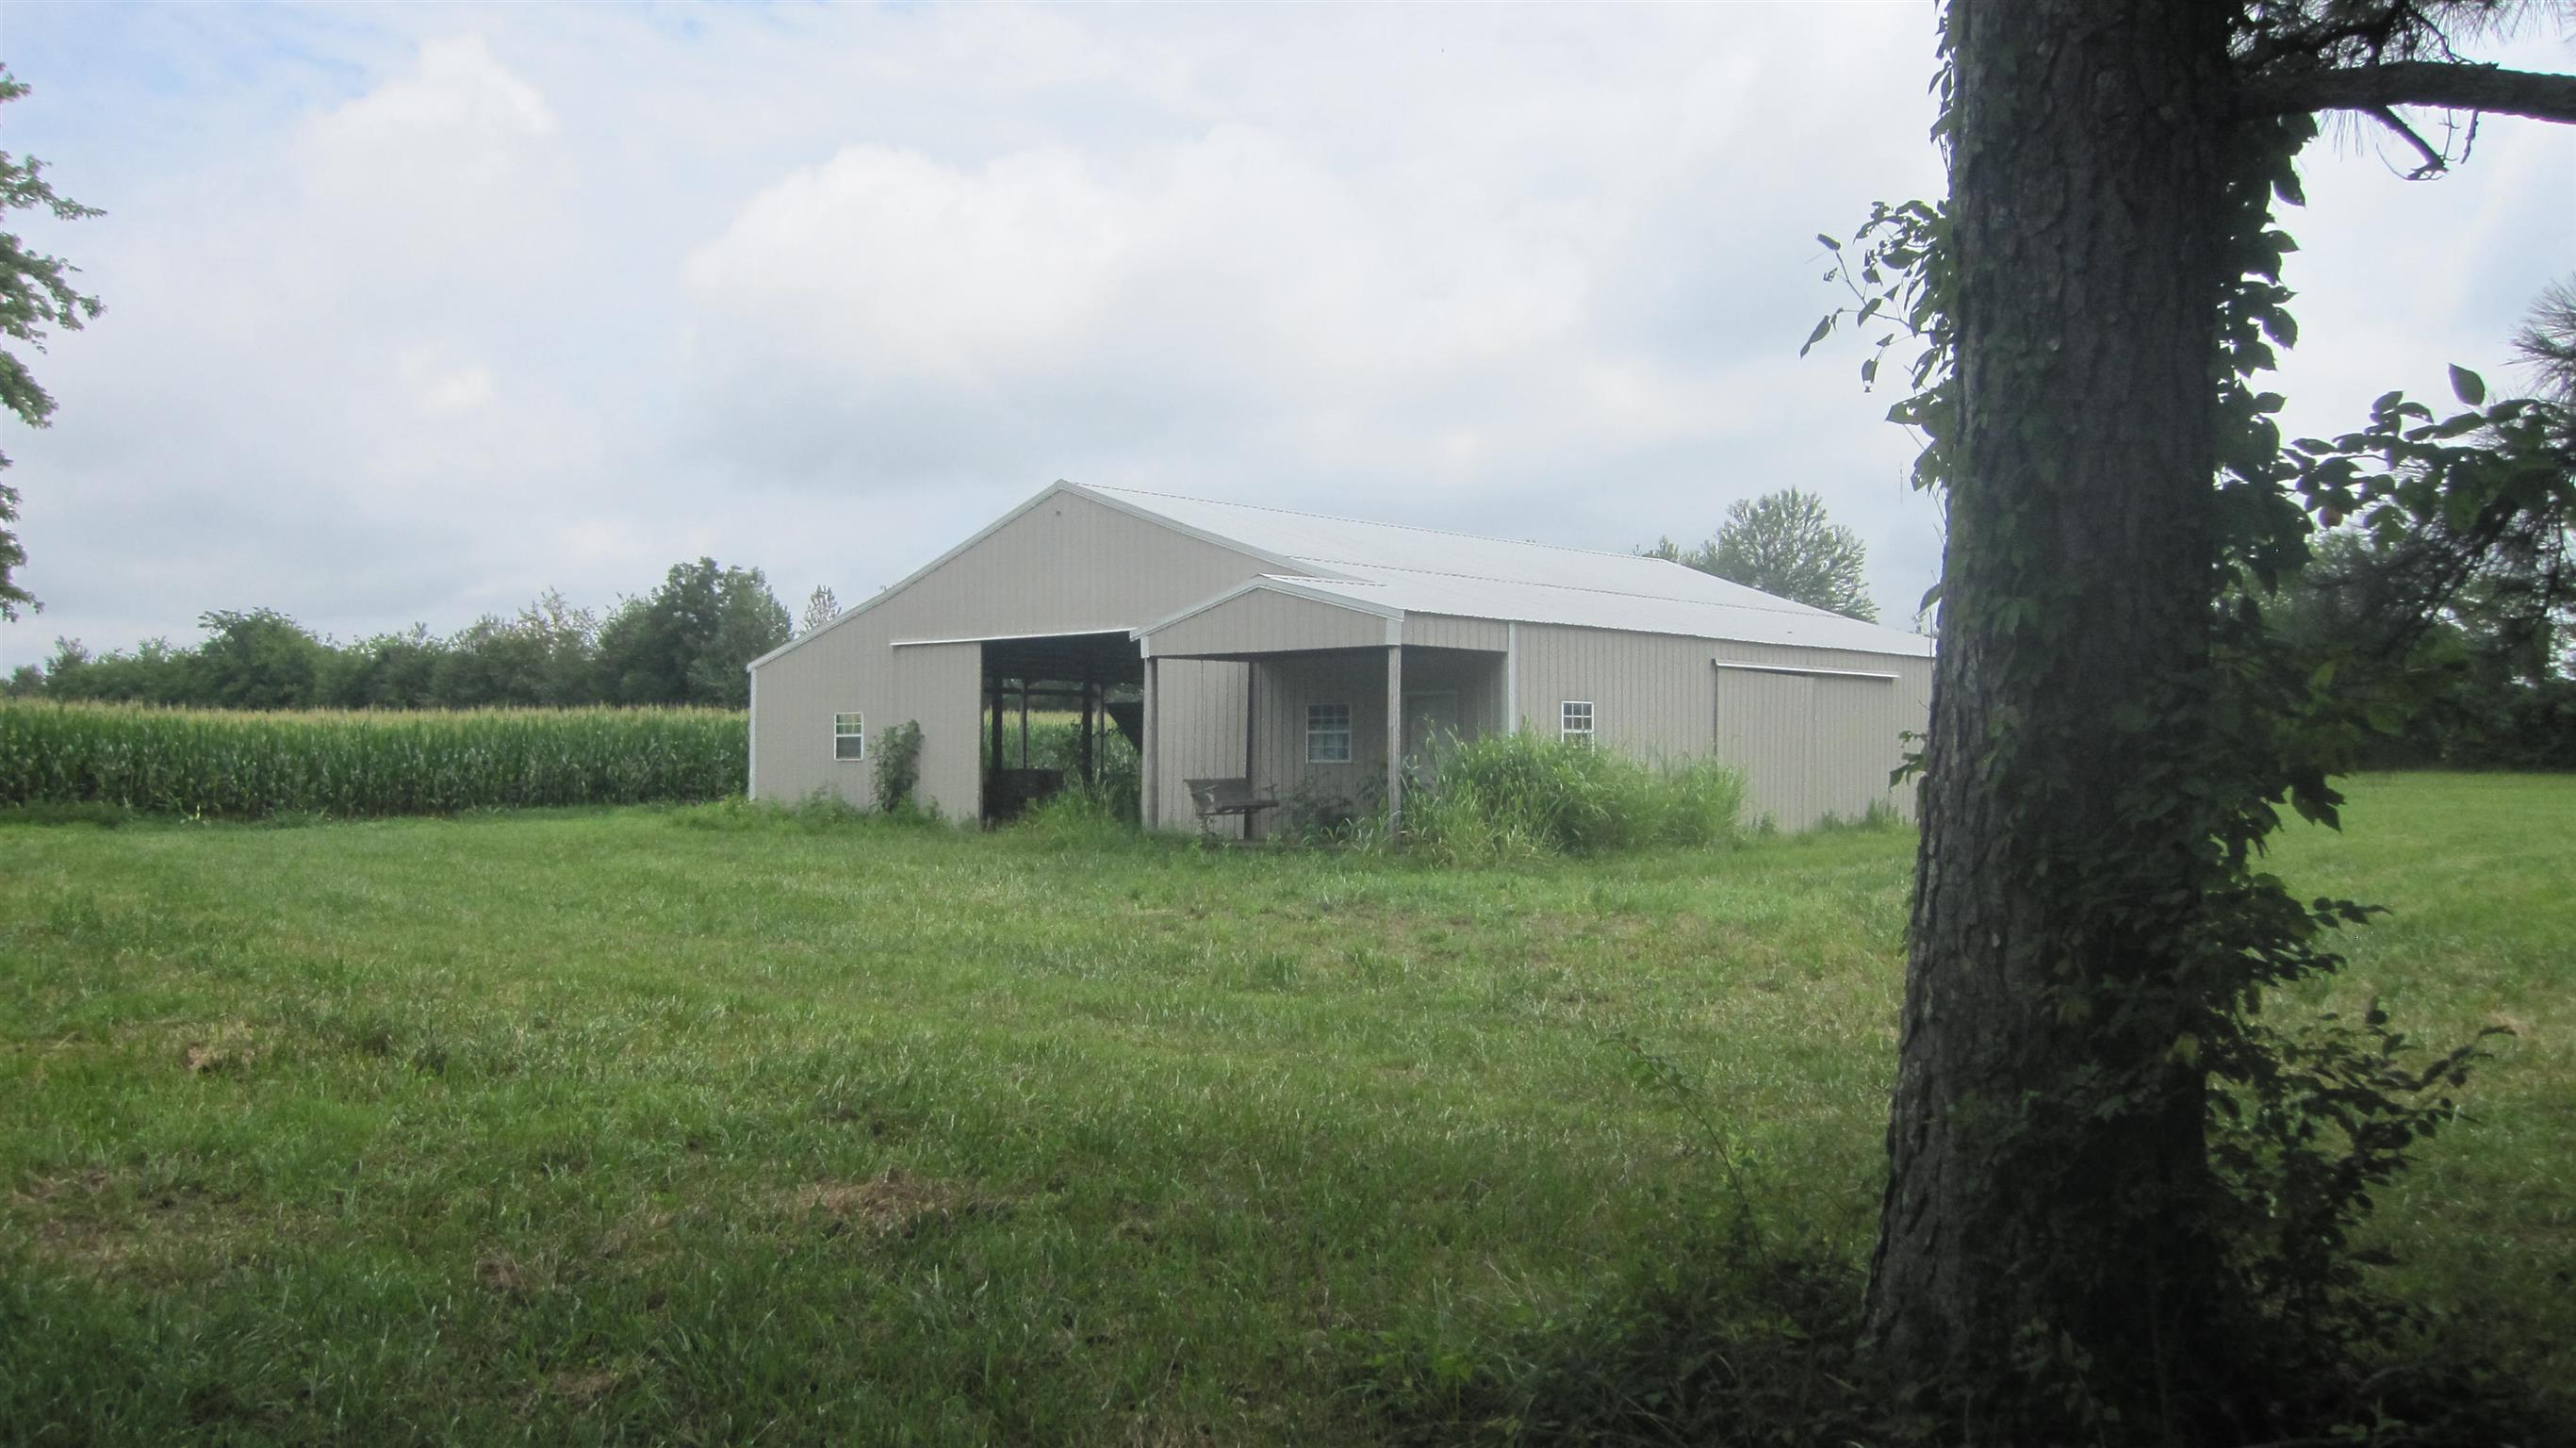 91 Monks Rd, Fayetteville, TN 37334 - Fayetteville, TN real estate listing